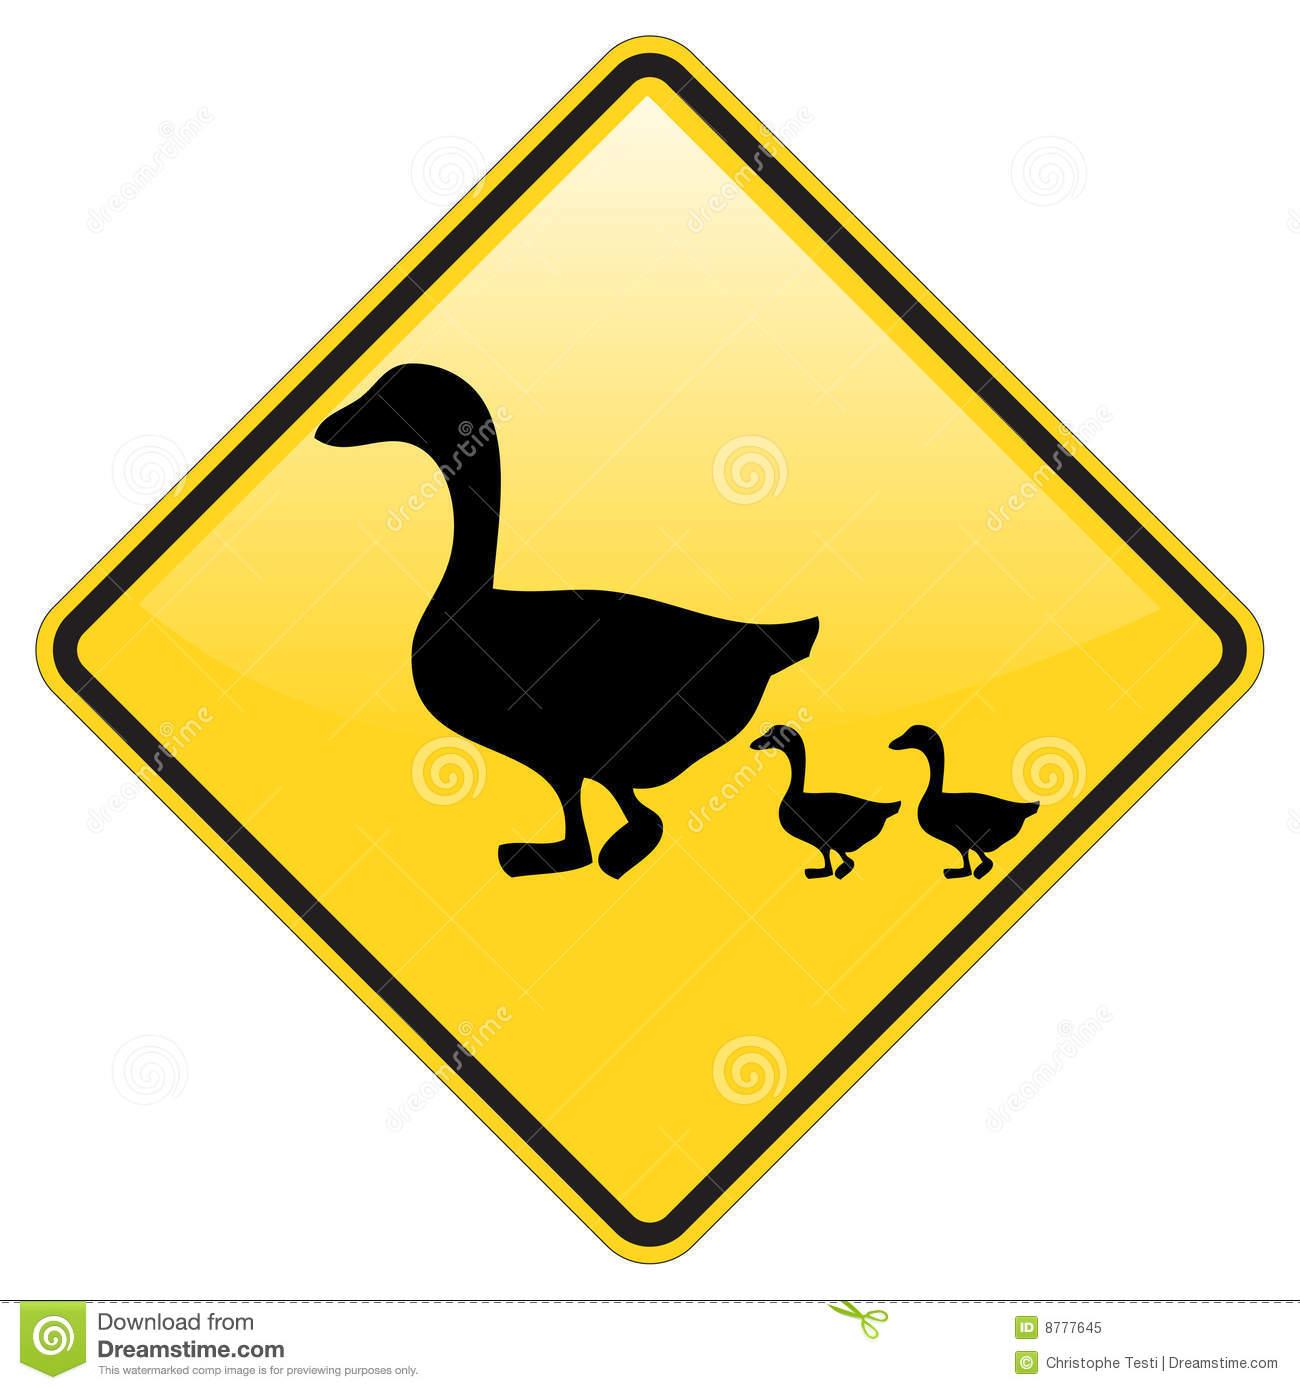 Ducks Crossing Warning Royalty Free Stock Photo.